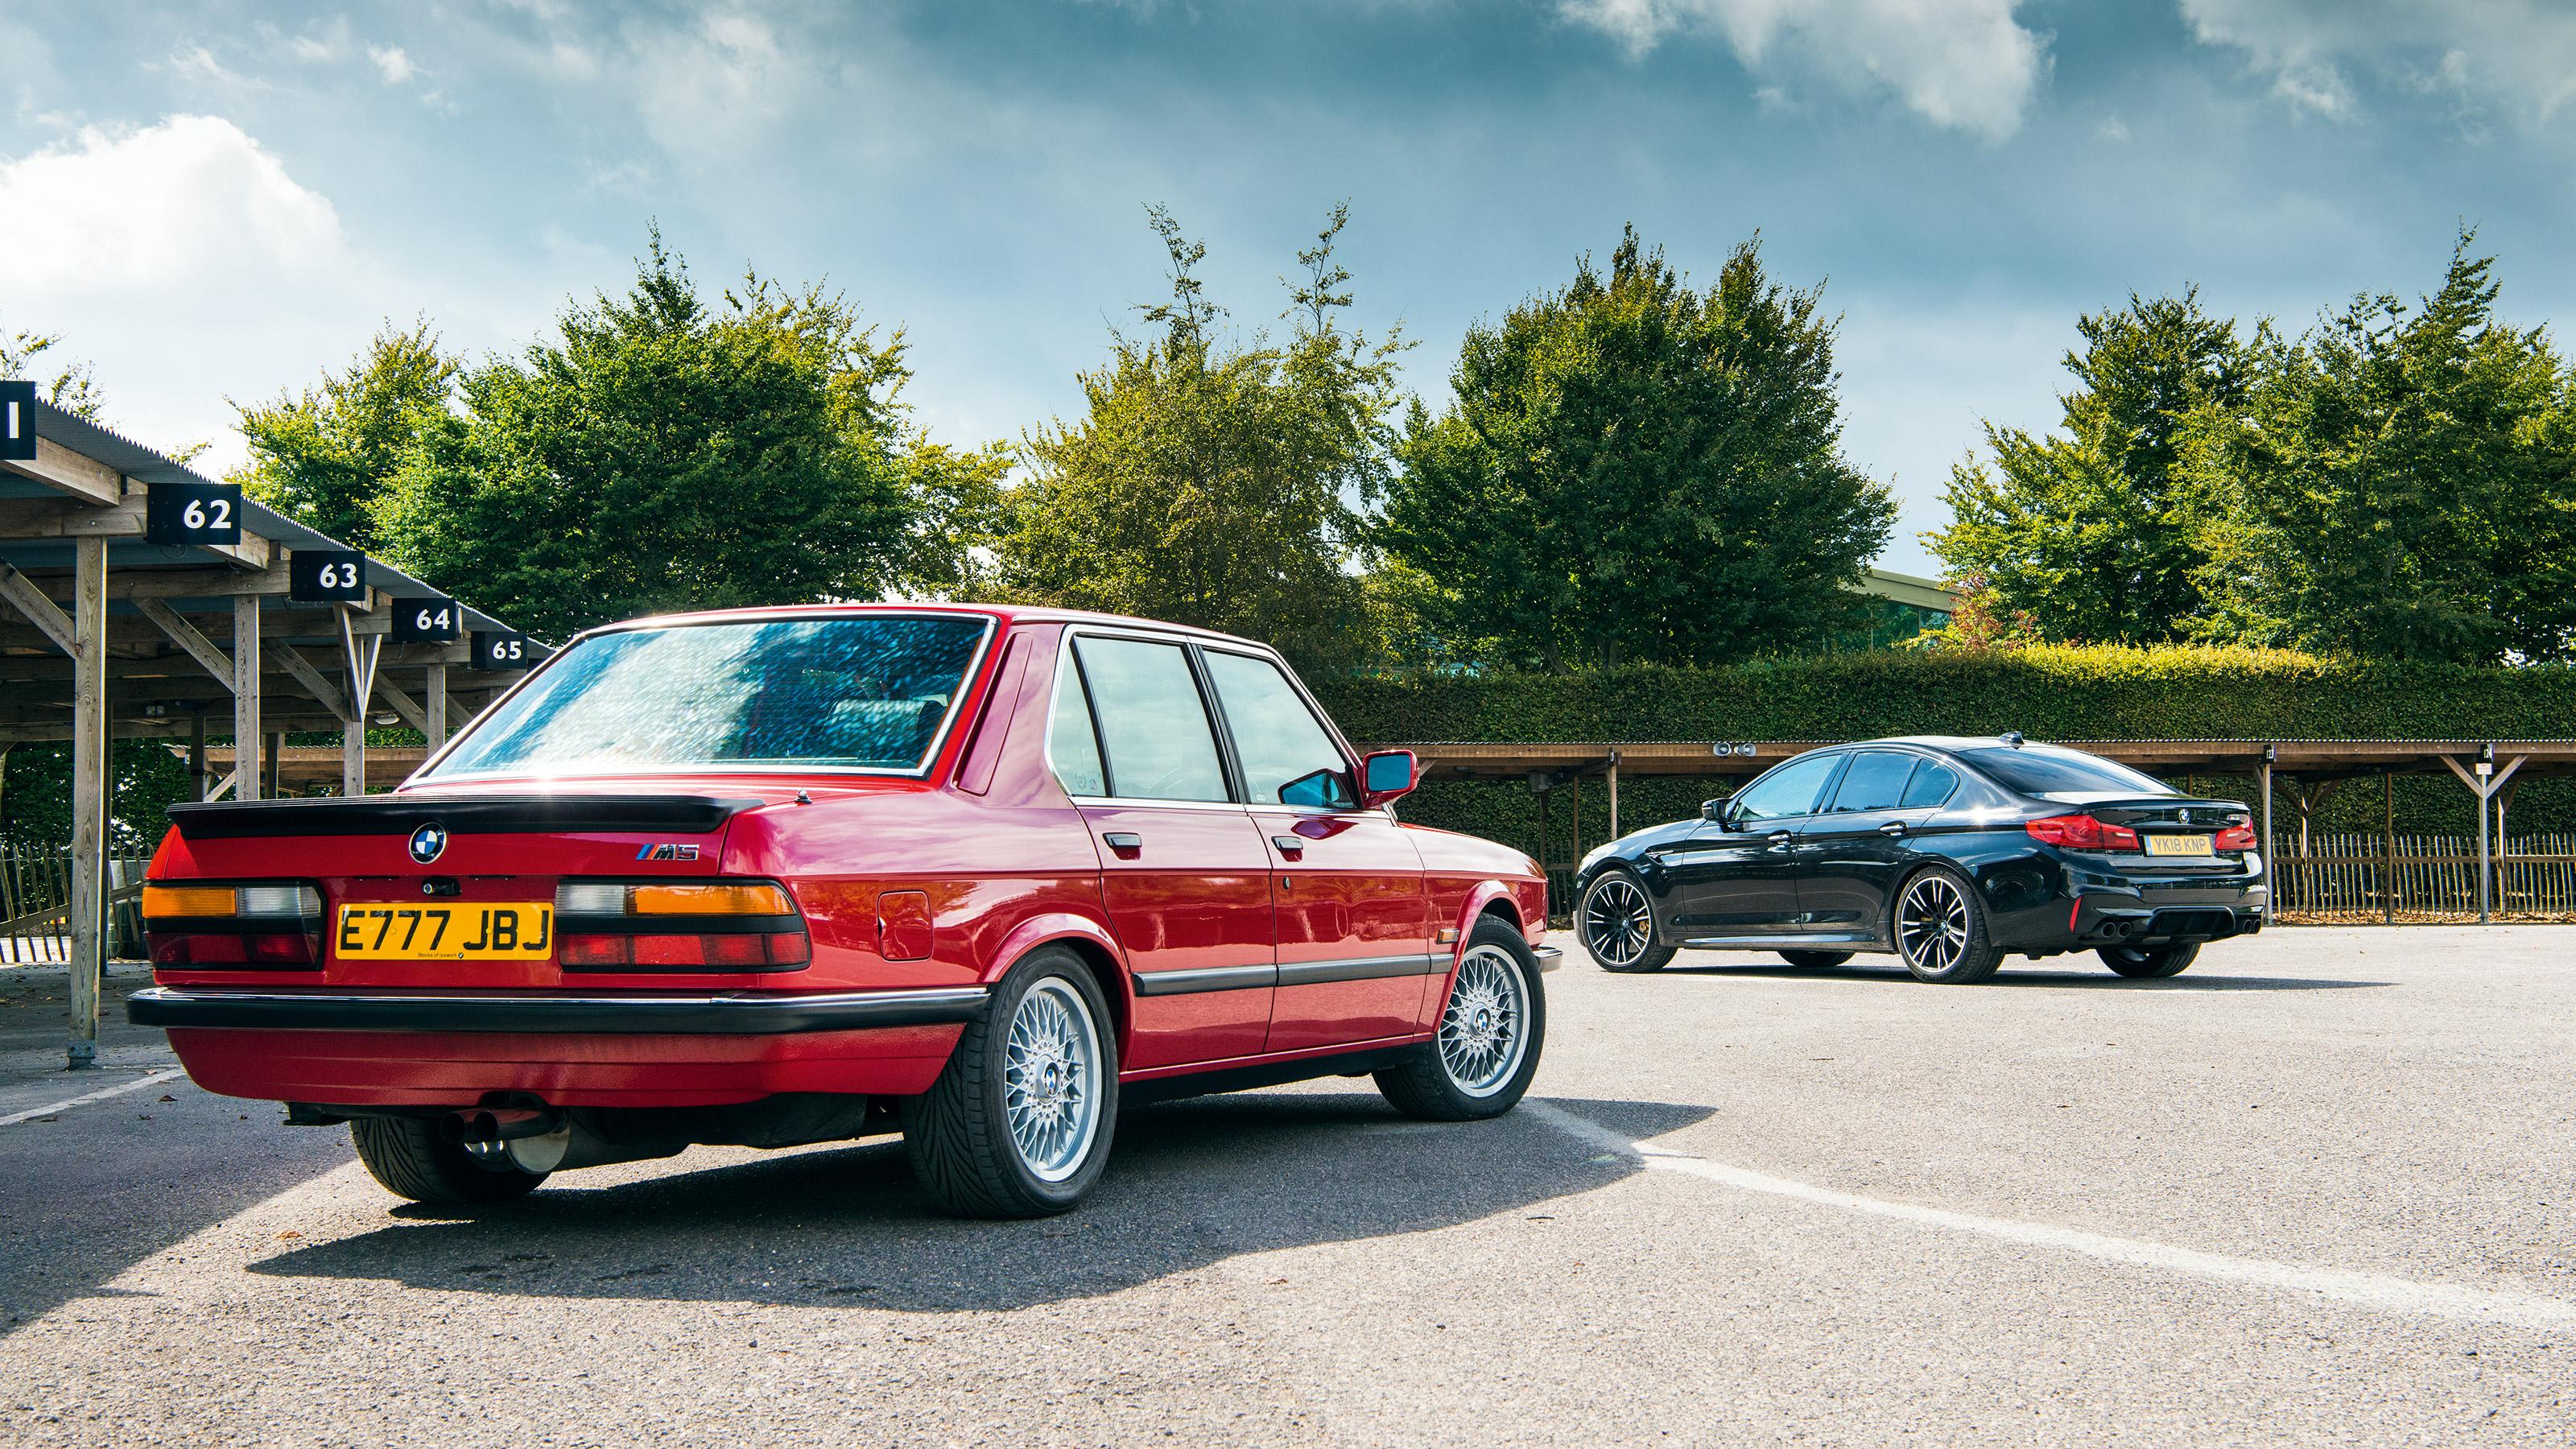 Bmw M5 F90 Vs E28 M5 Rs6 E500 And Lotus Carlton Supersaloons Old Vs New Evo